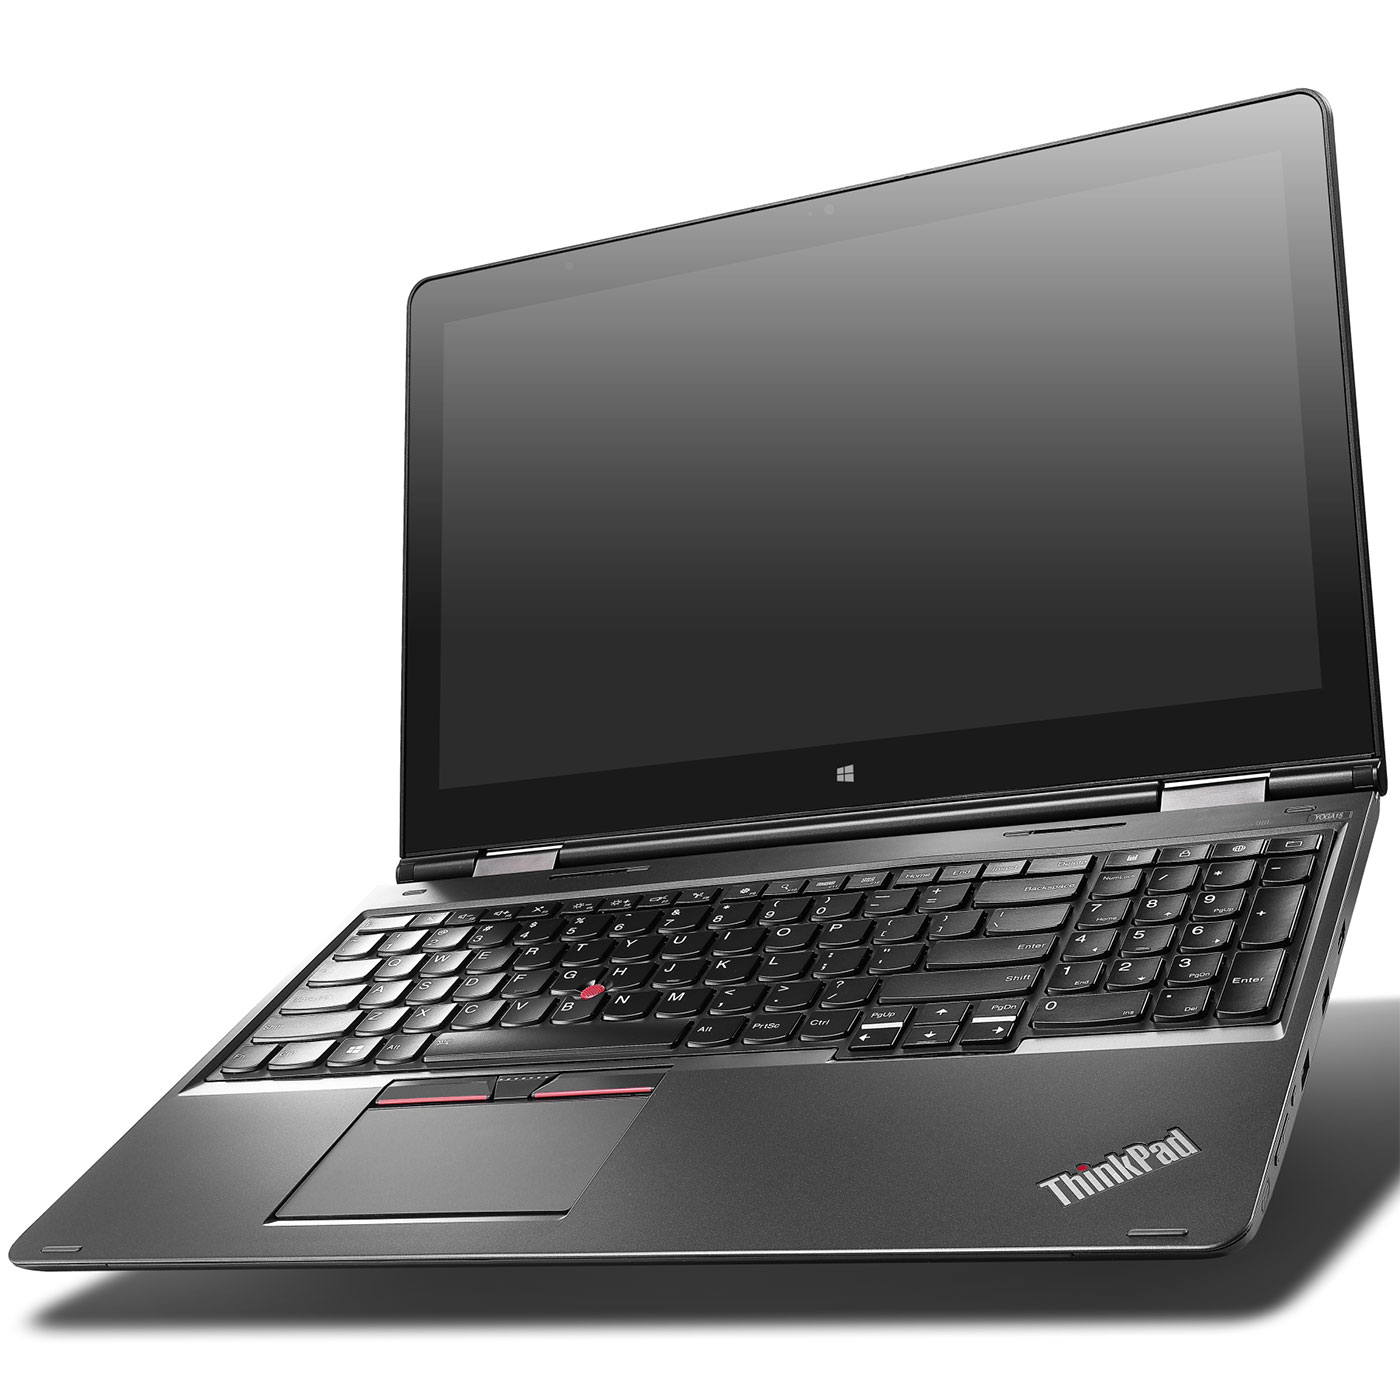 Lenovo ThinkPad Yoga 15 (20DQ003EFR) Intel Core i3-5010U 4 Go SSD 180 Go  15